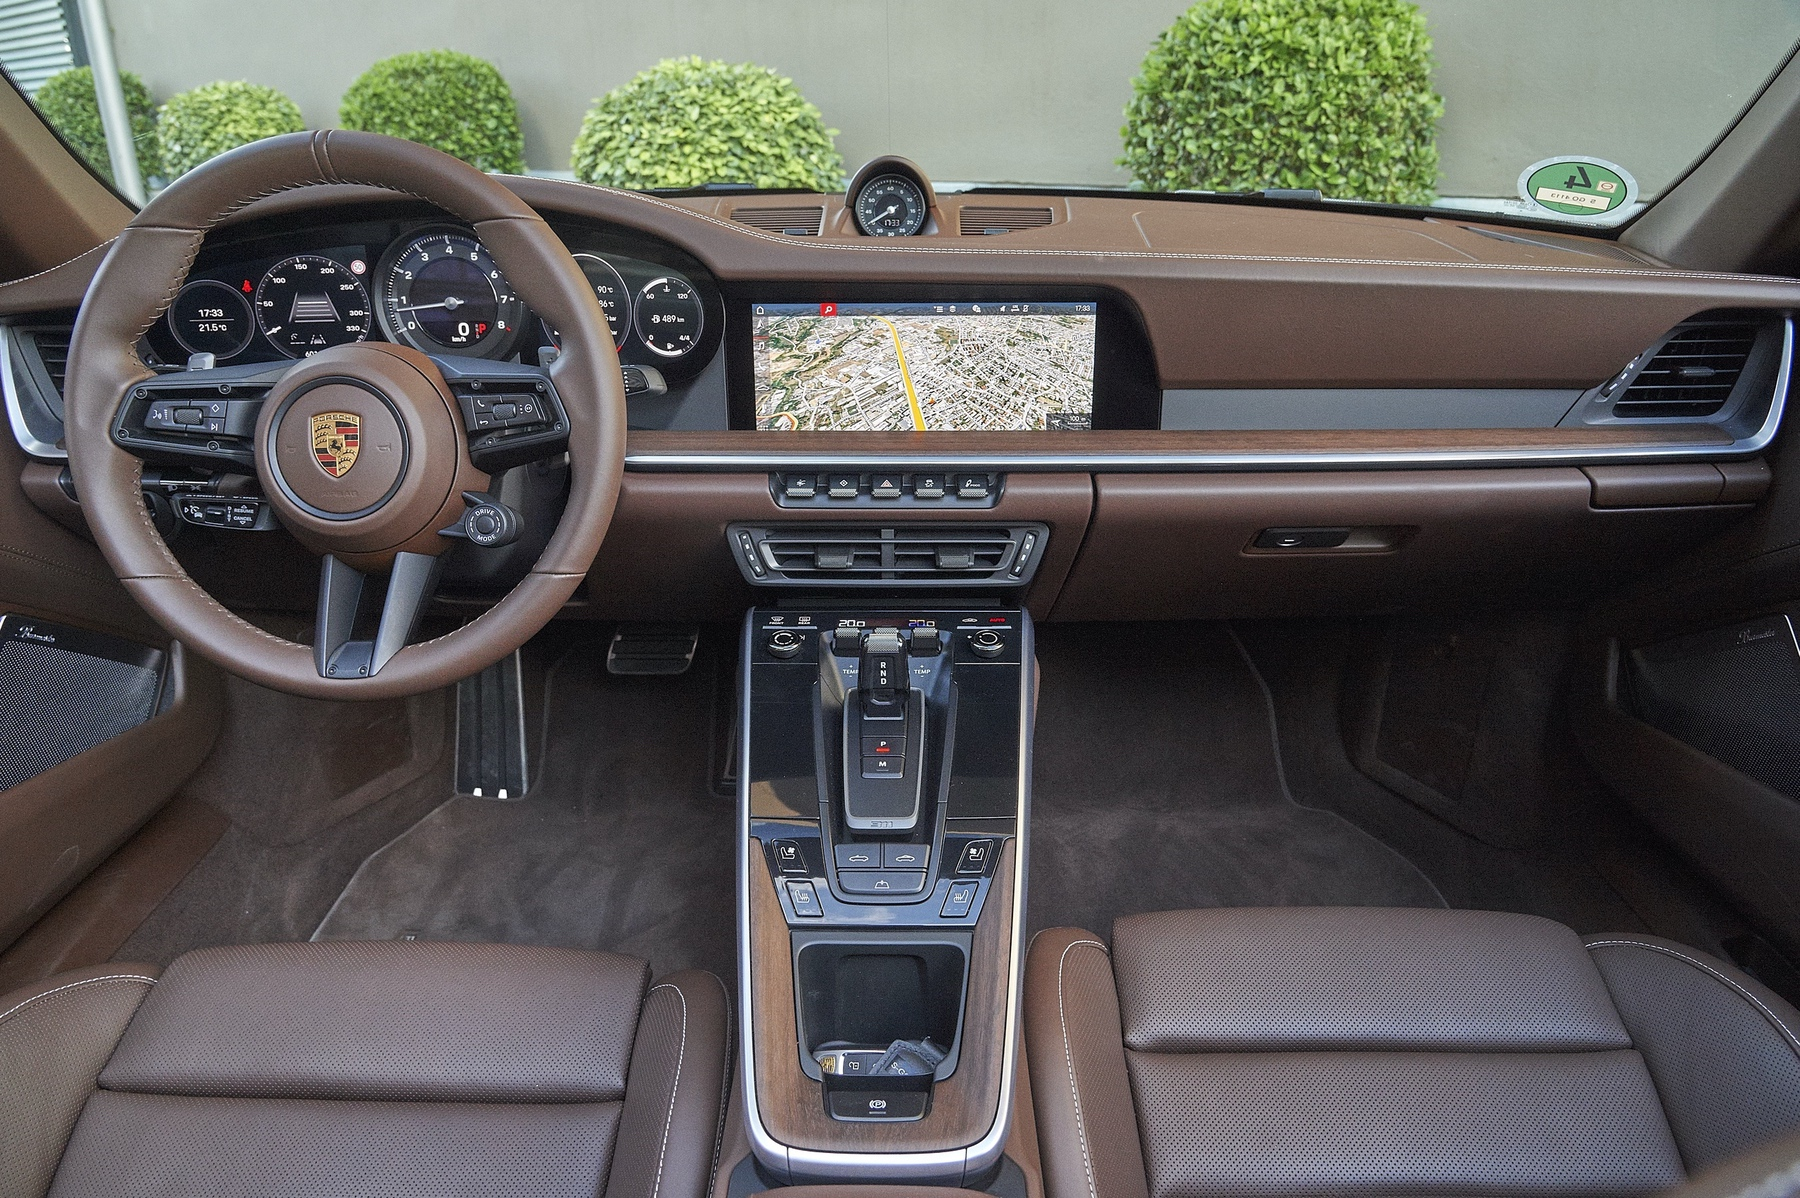 Test_Drive_Porsche_911_Athens_0176